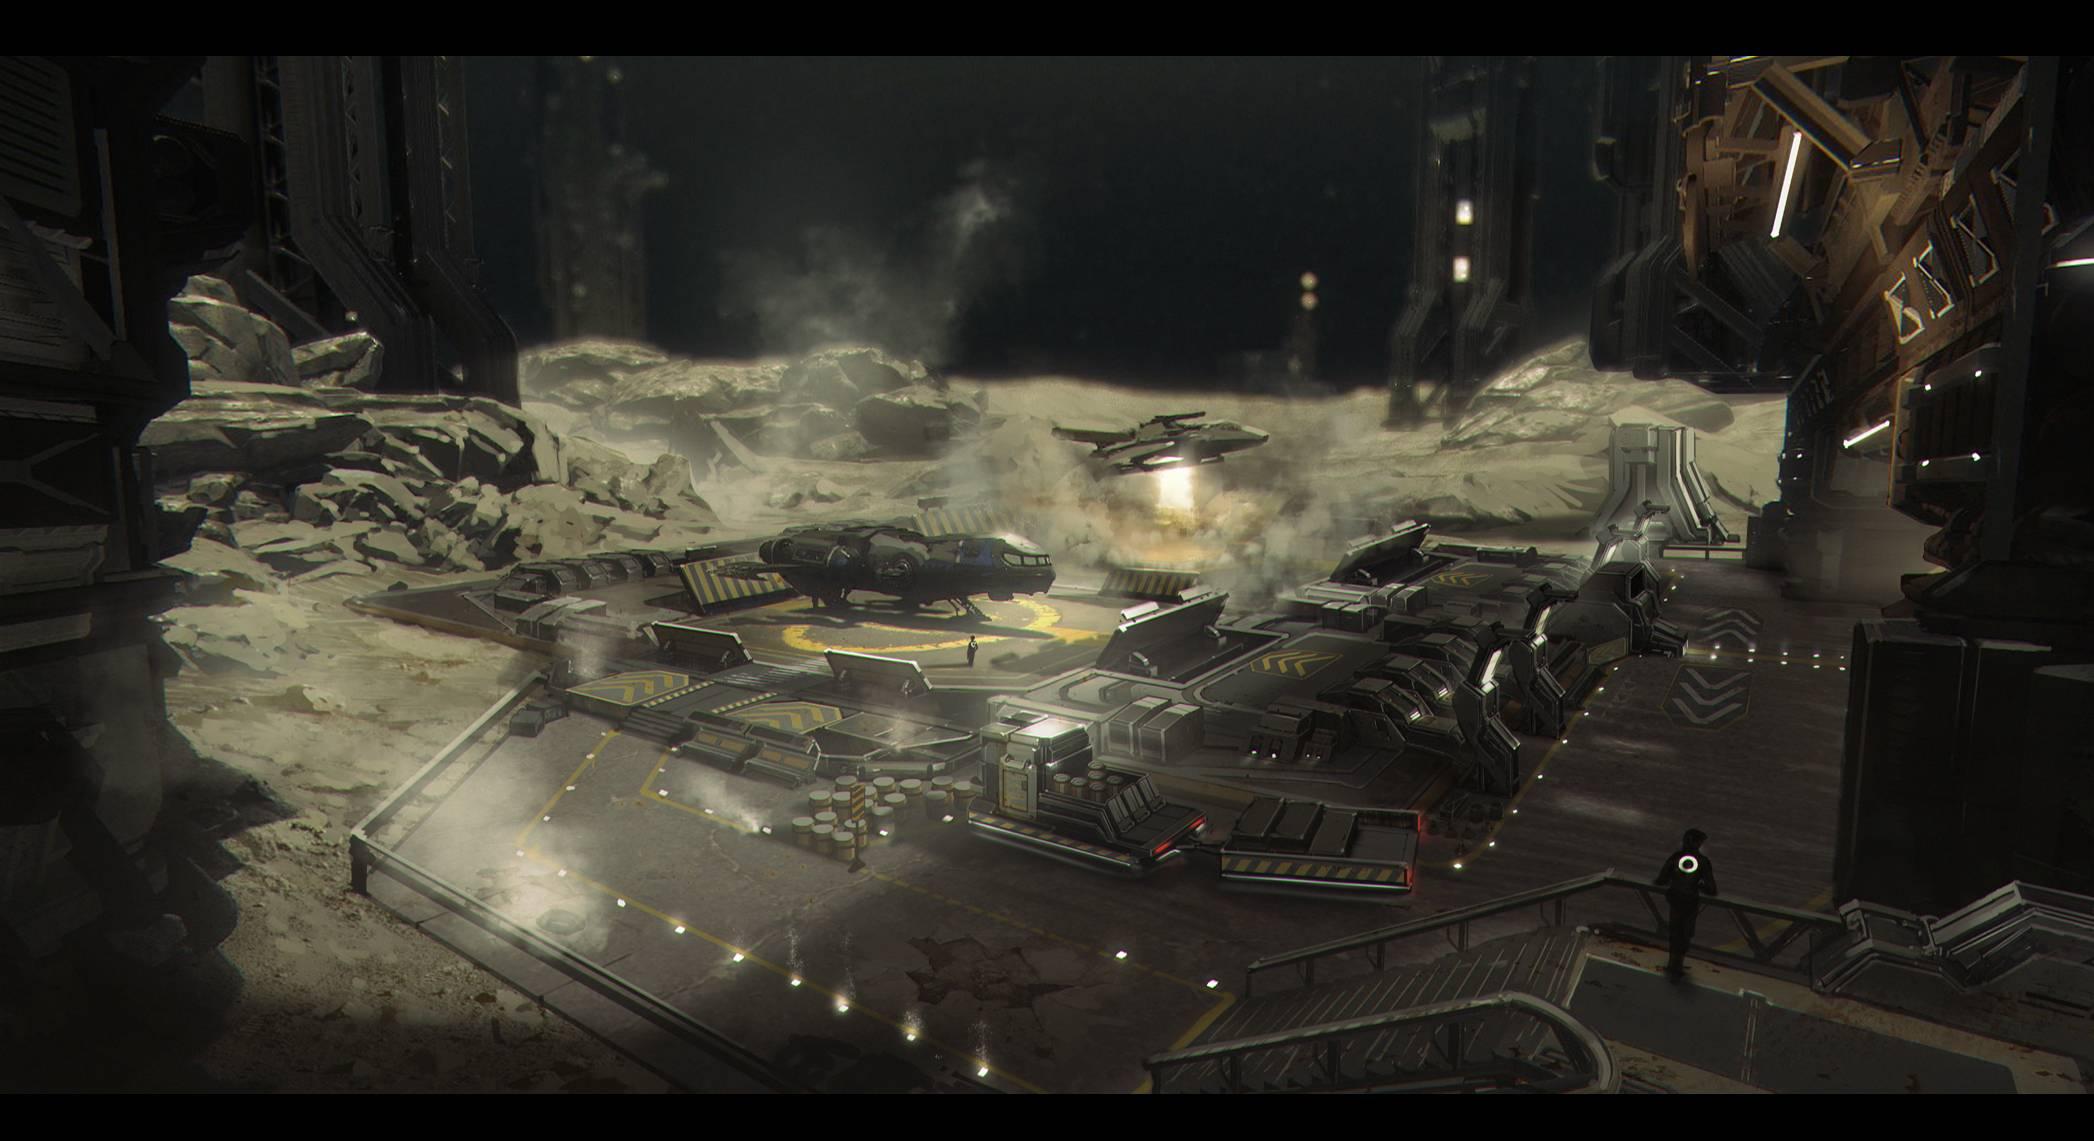 (Vanguard Asteroid Base #19, Delamar Debris Fields)